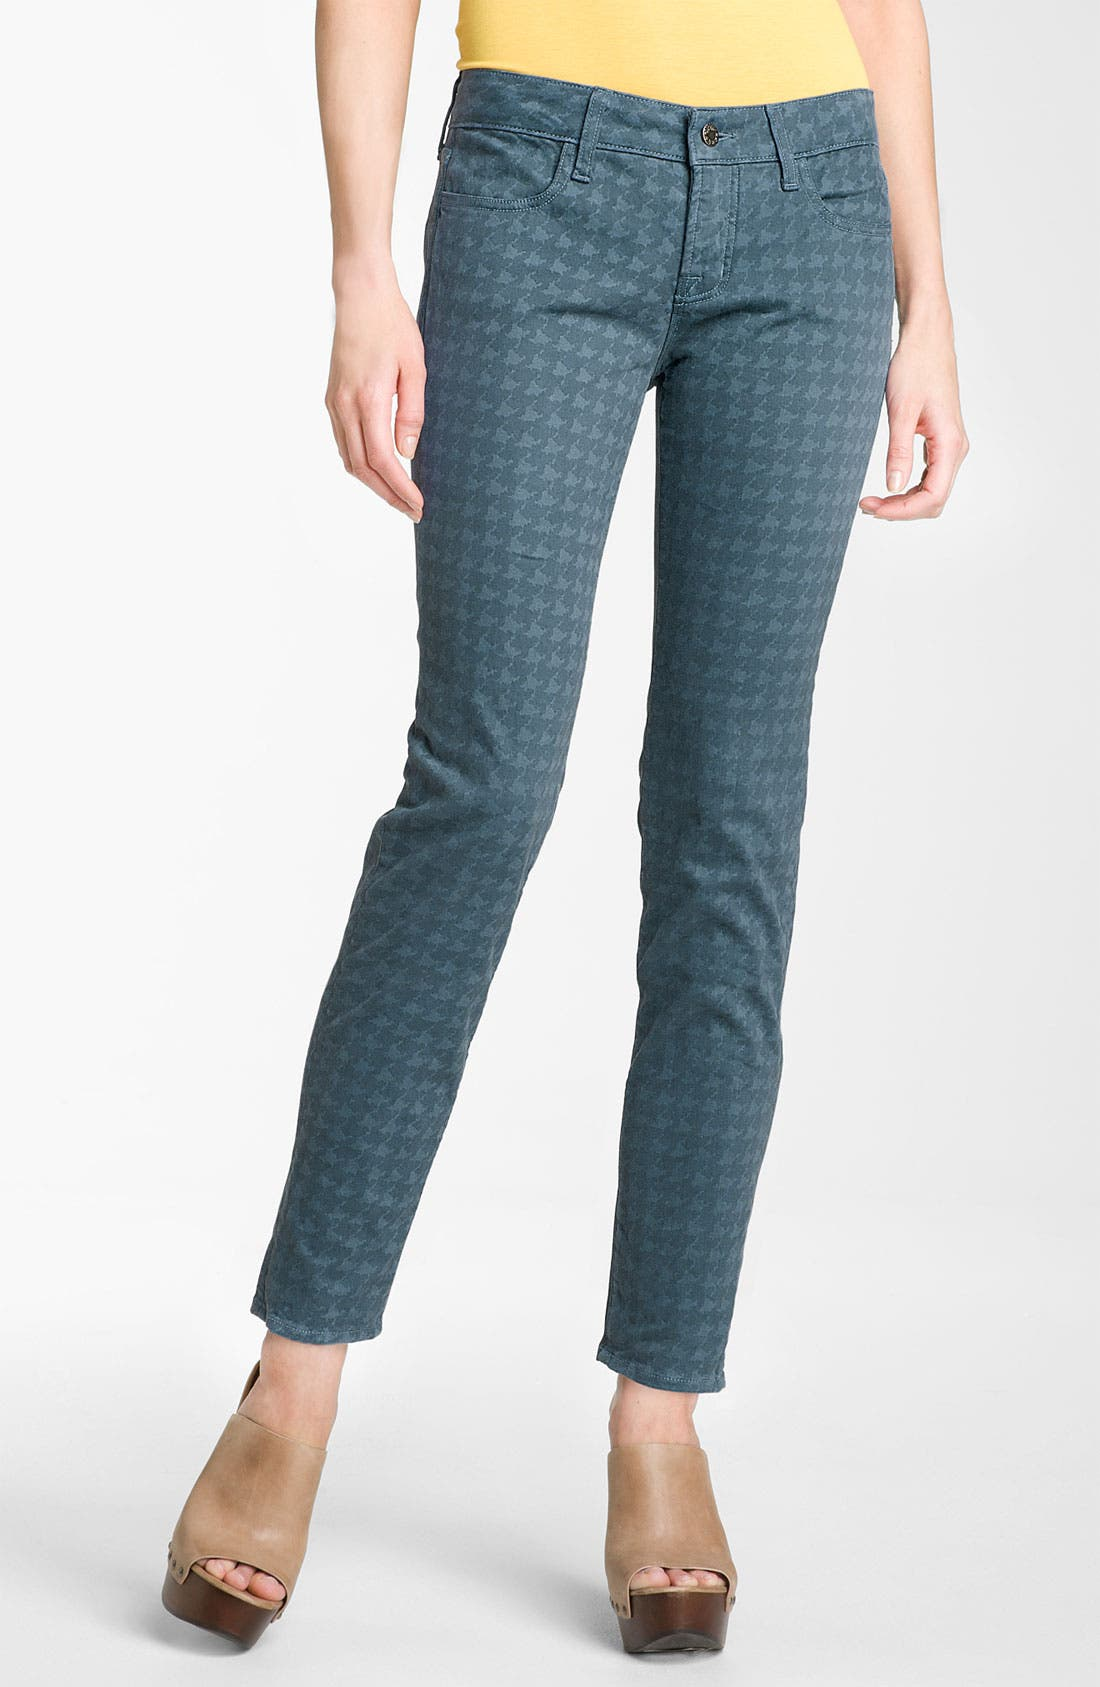 Alternate Image 2  - Blue Essence Houndstooth Twill Jeans (Plus)